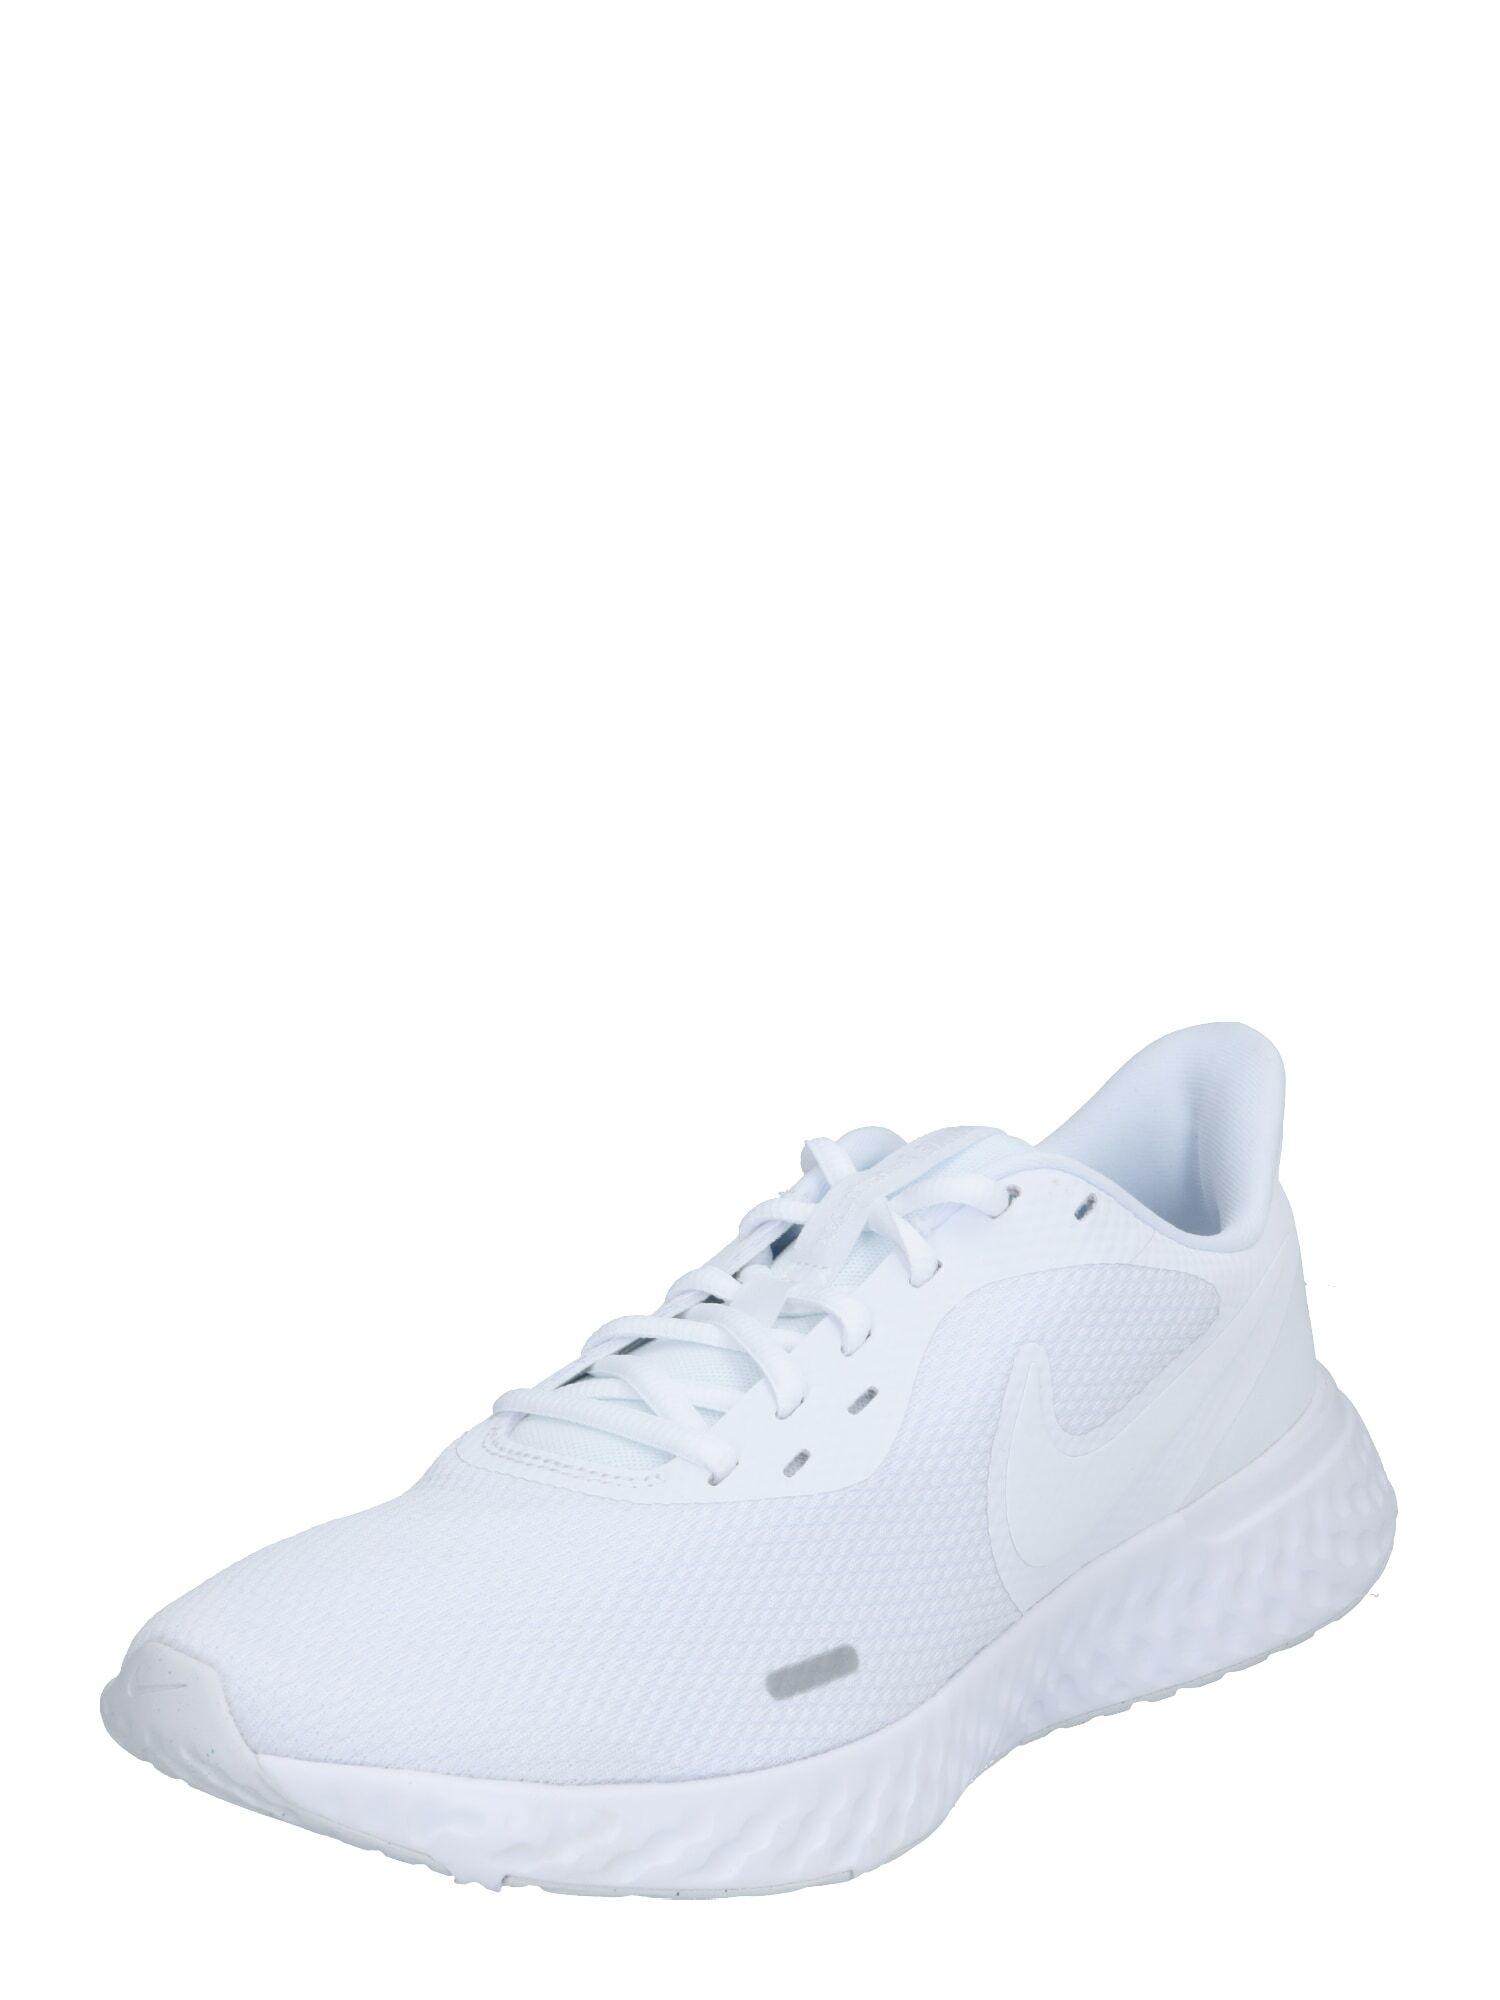 NIKE Chaussure de course 'Revolution 5'  - Blanc - Taille: 9.5 - male